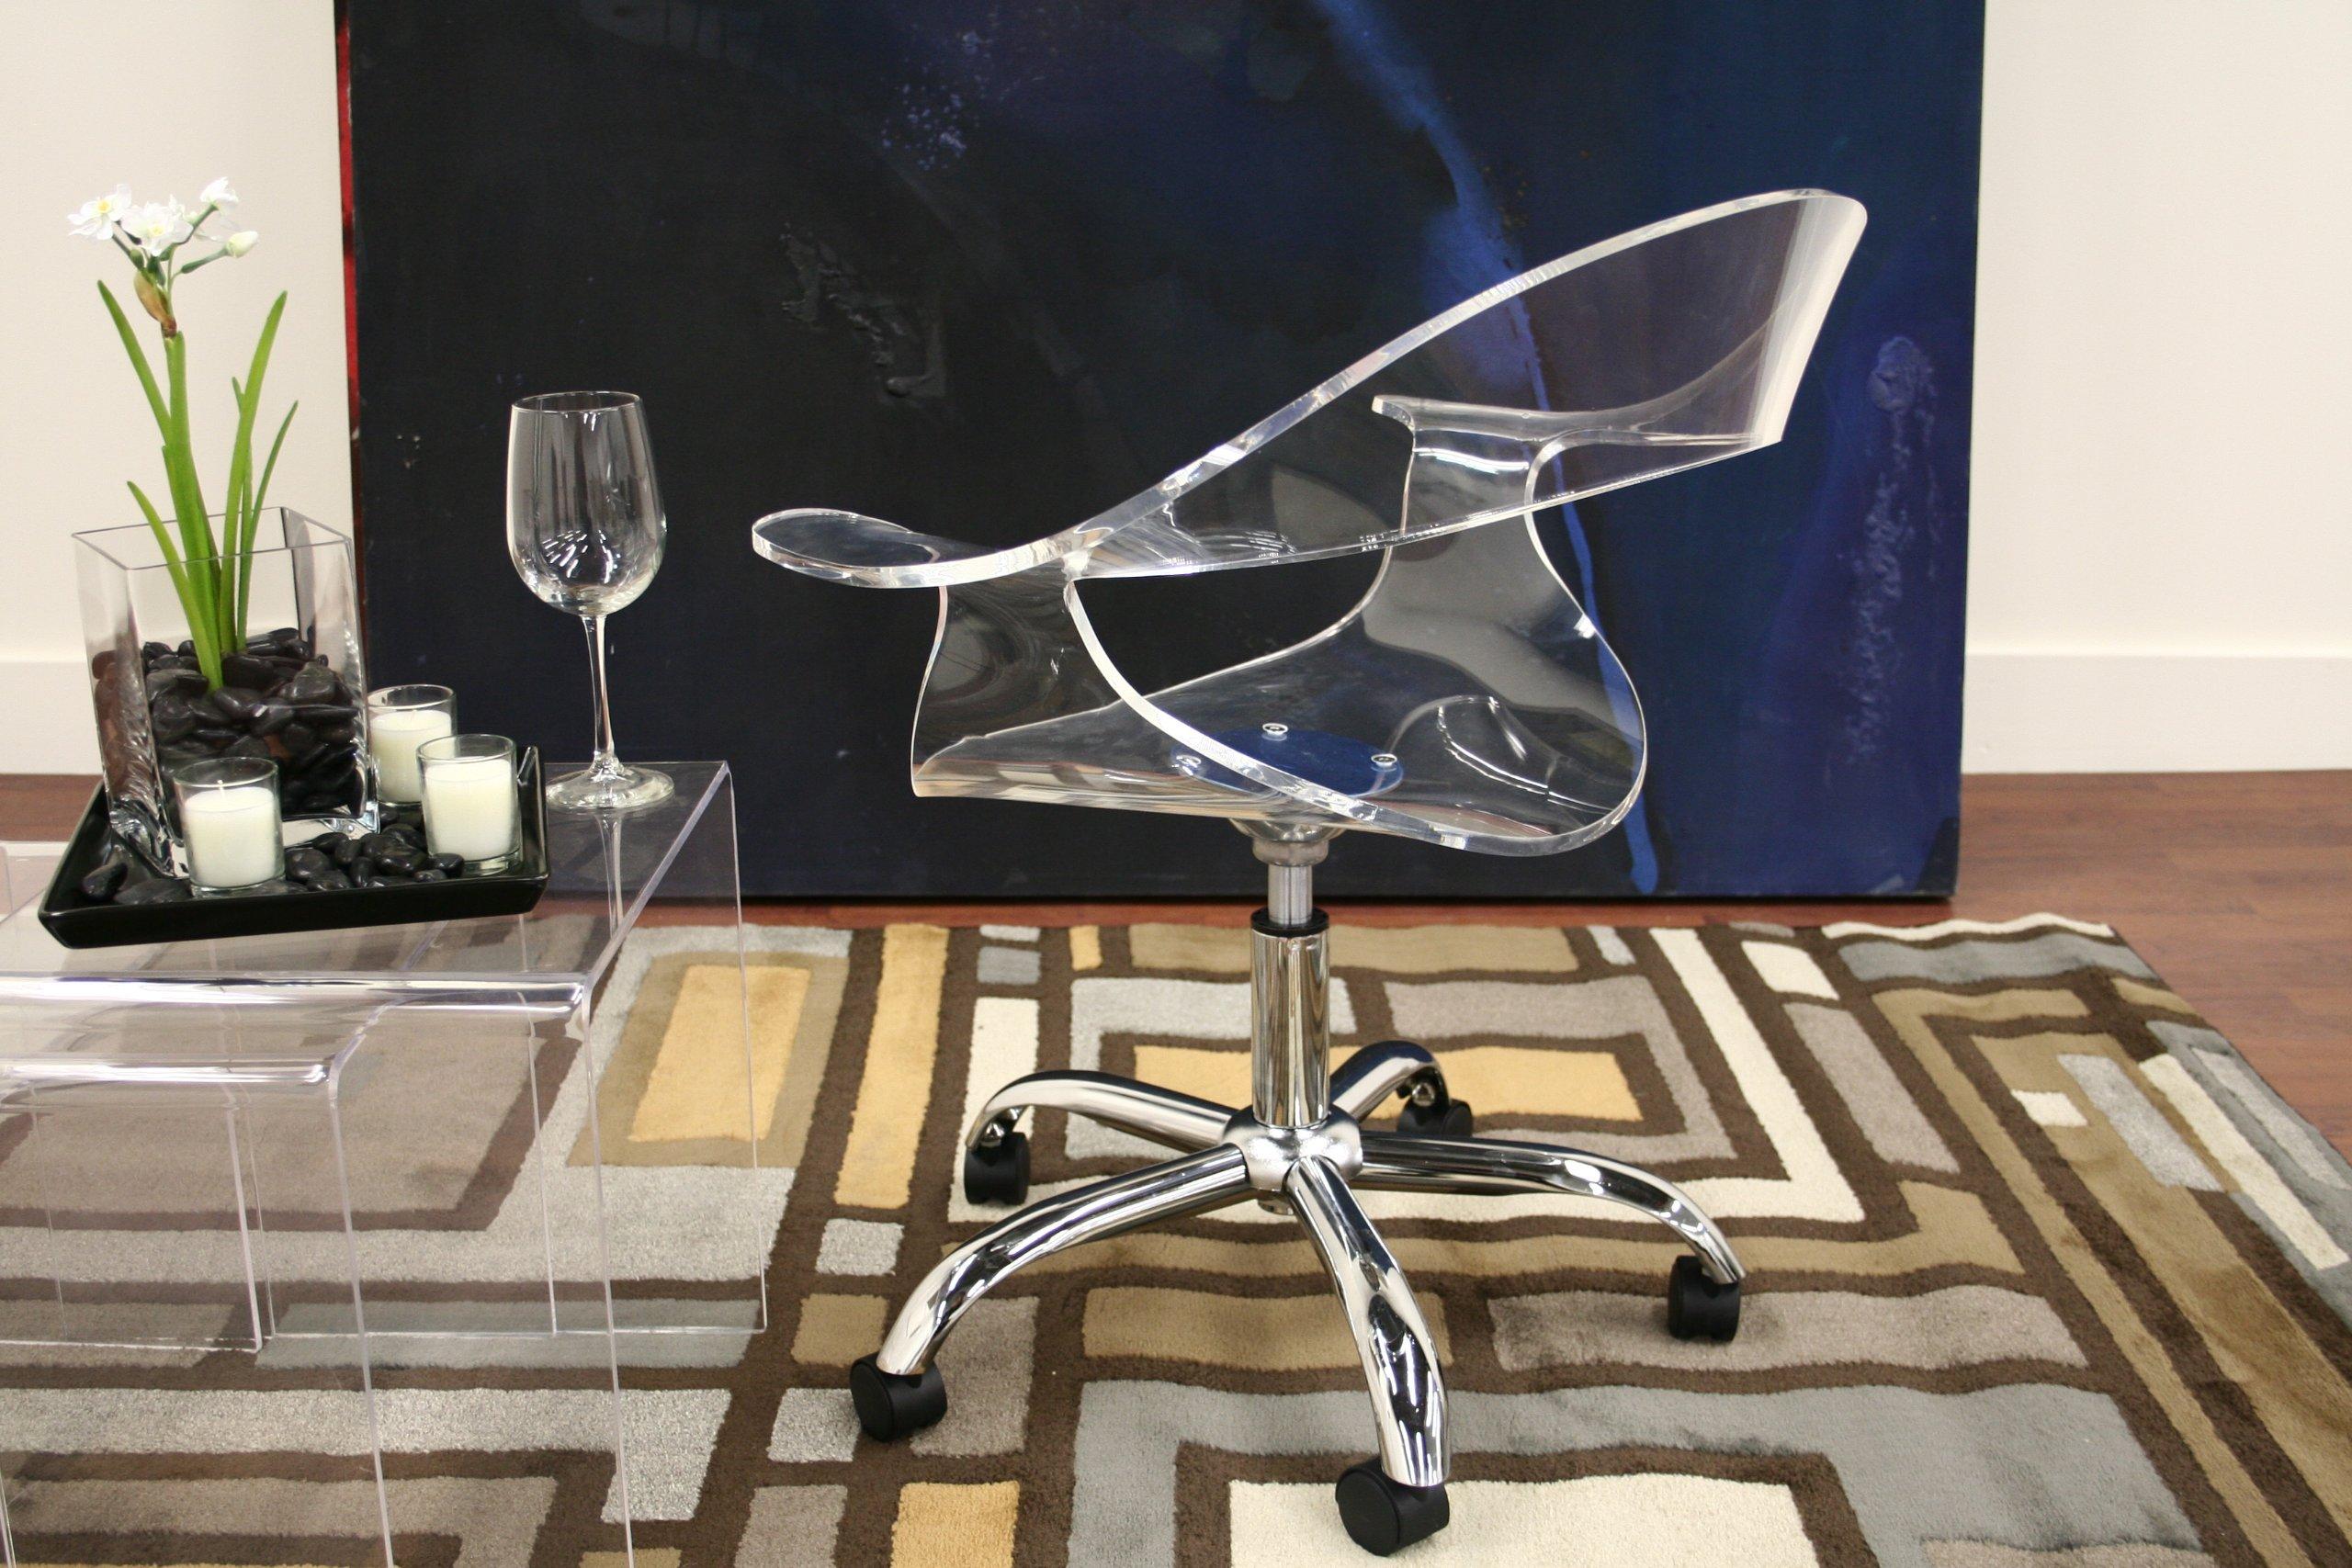 Baxton Studio KERR Acrylic Swivel Chair  FurnitureNdecorcom